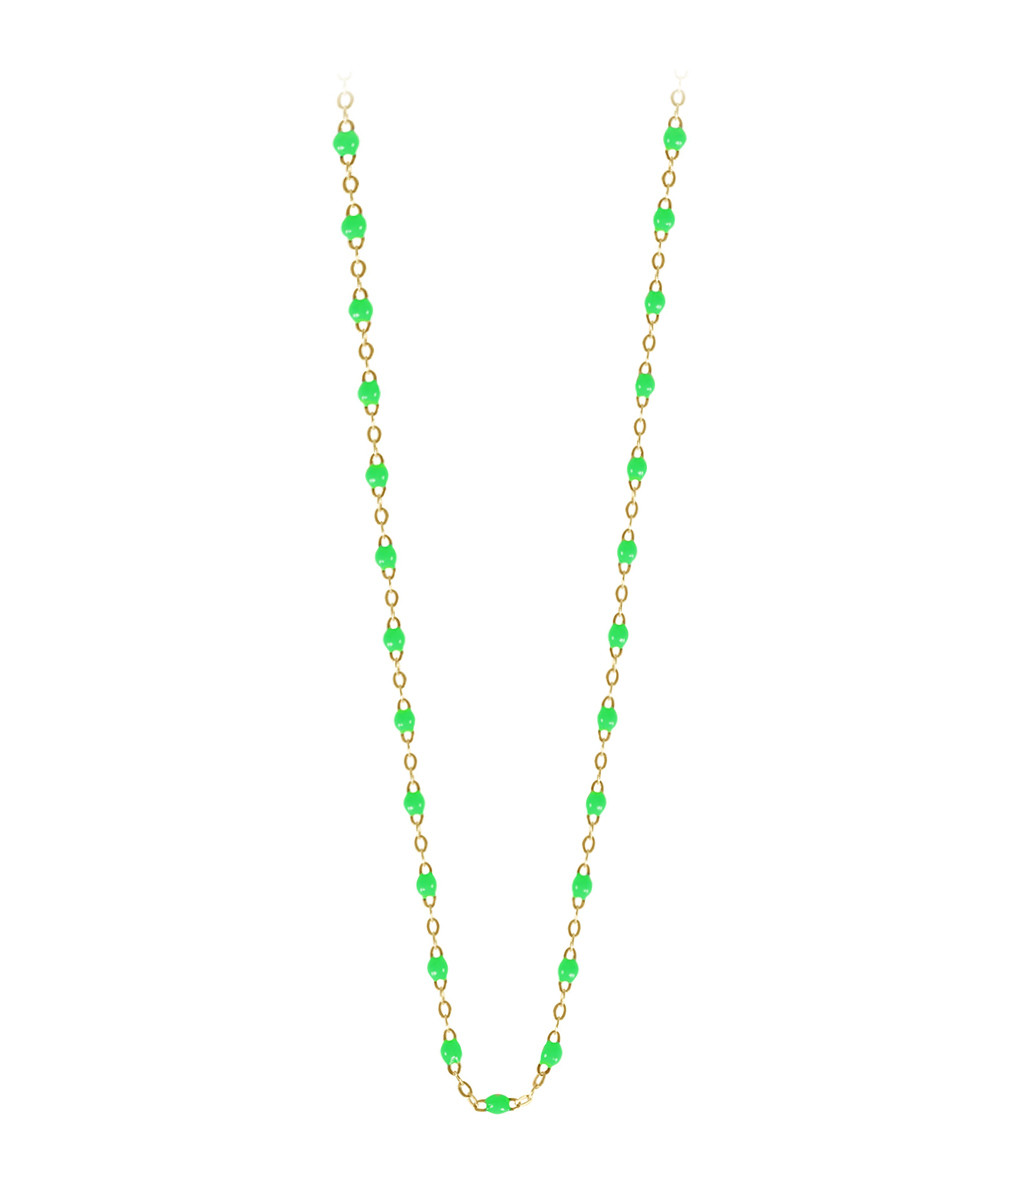 Sautoir Perles Résine 86 cm - Gigi Clozeau